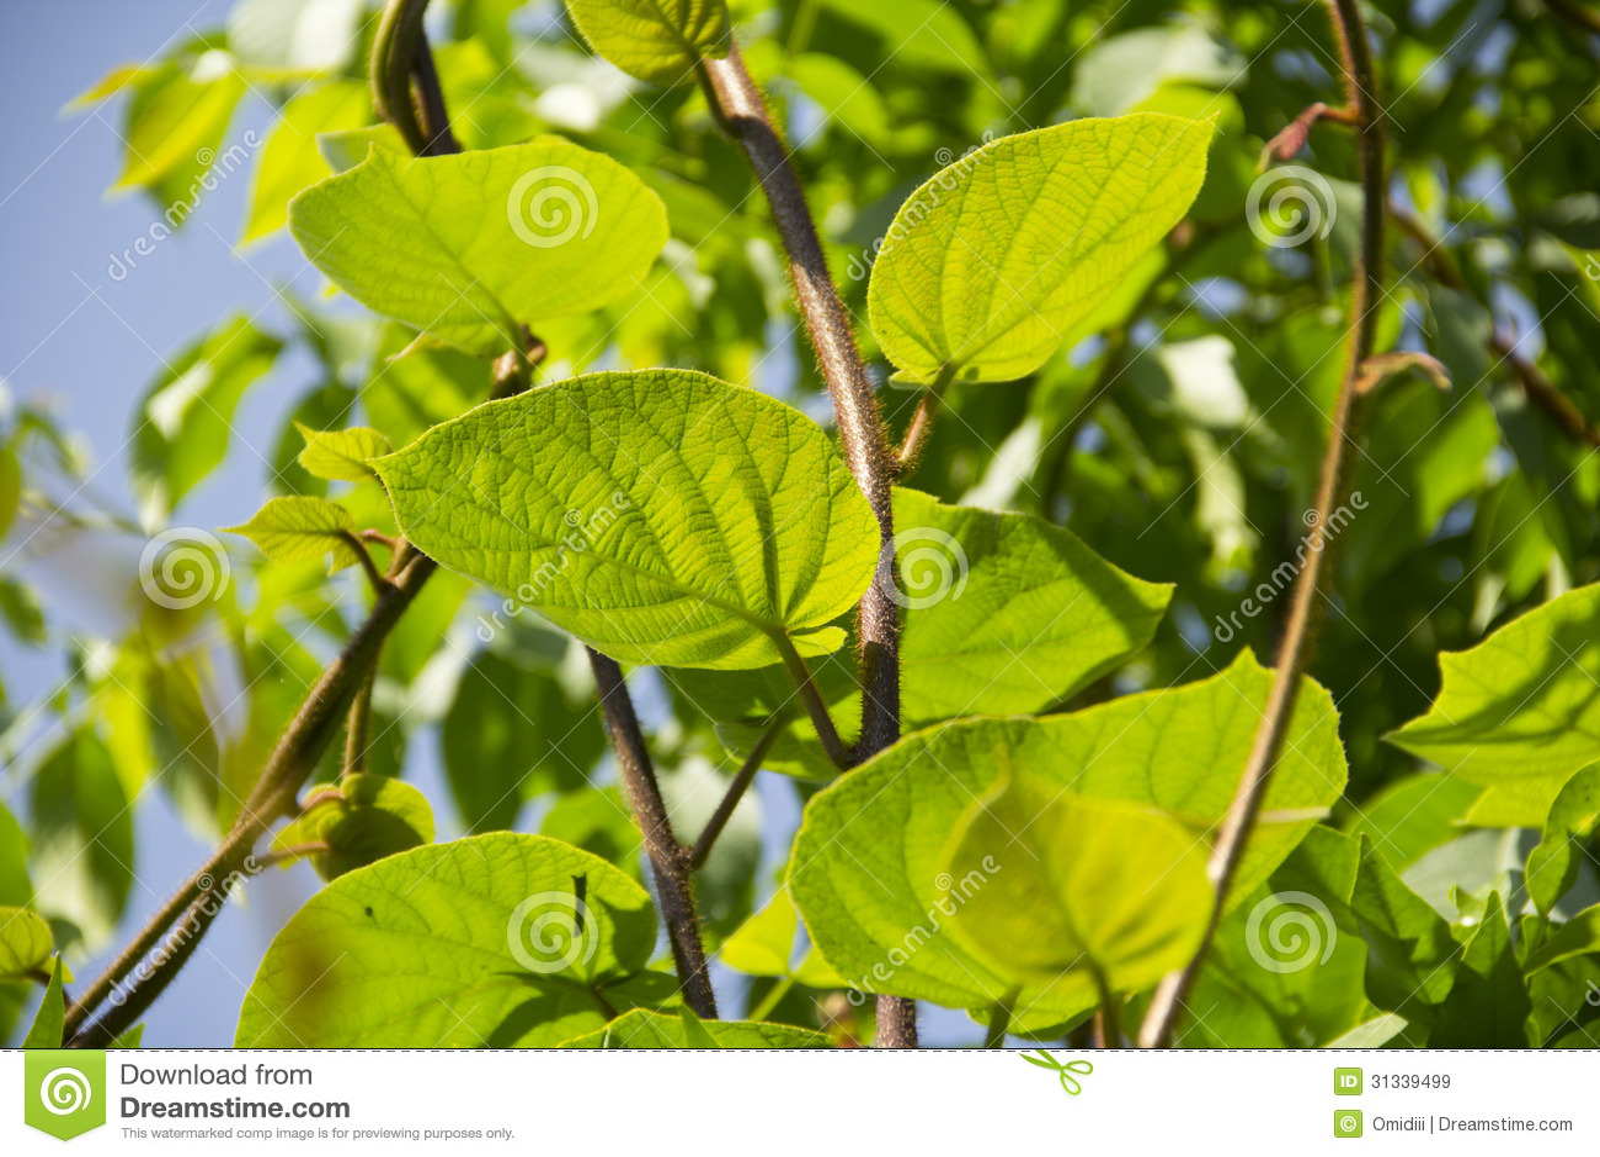 arbre de kiwi stock images - download 1,643 photos